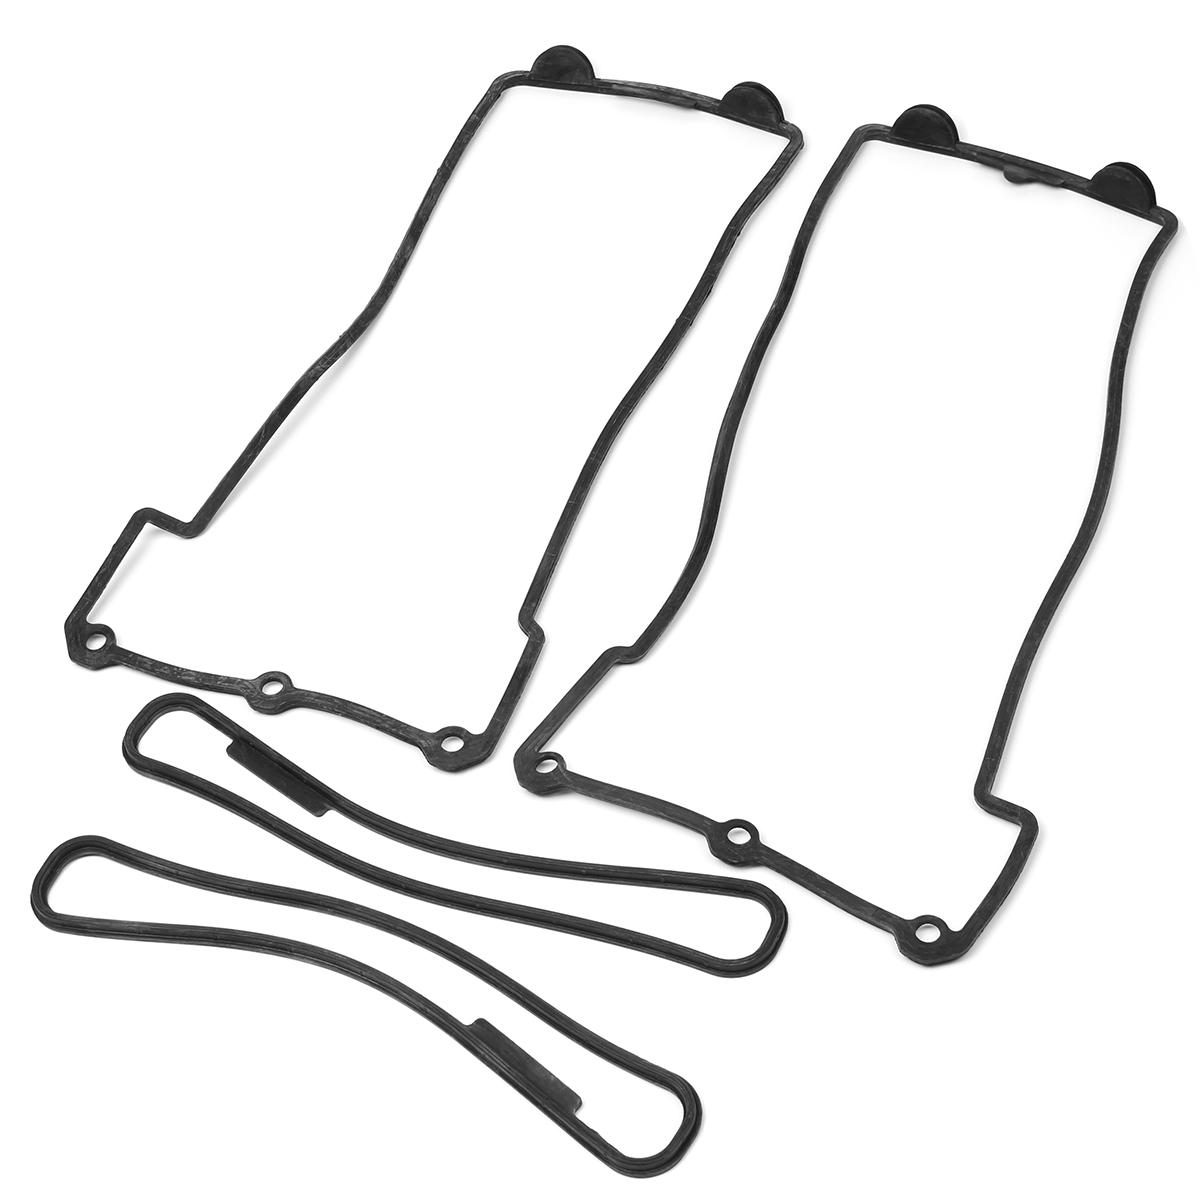 Valve Cover Gasket And 22 Grommets Kit For Bmw 530i 540i